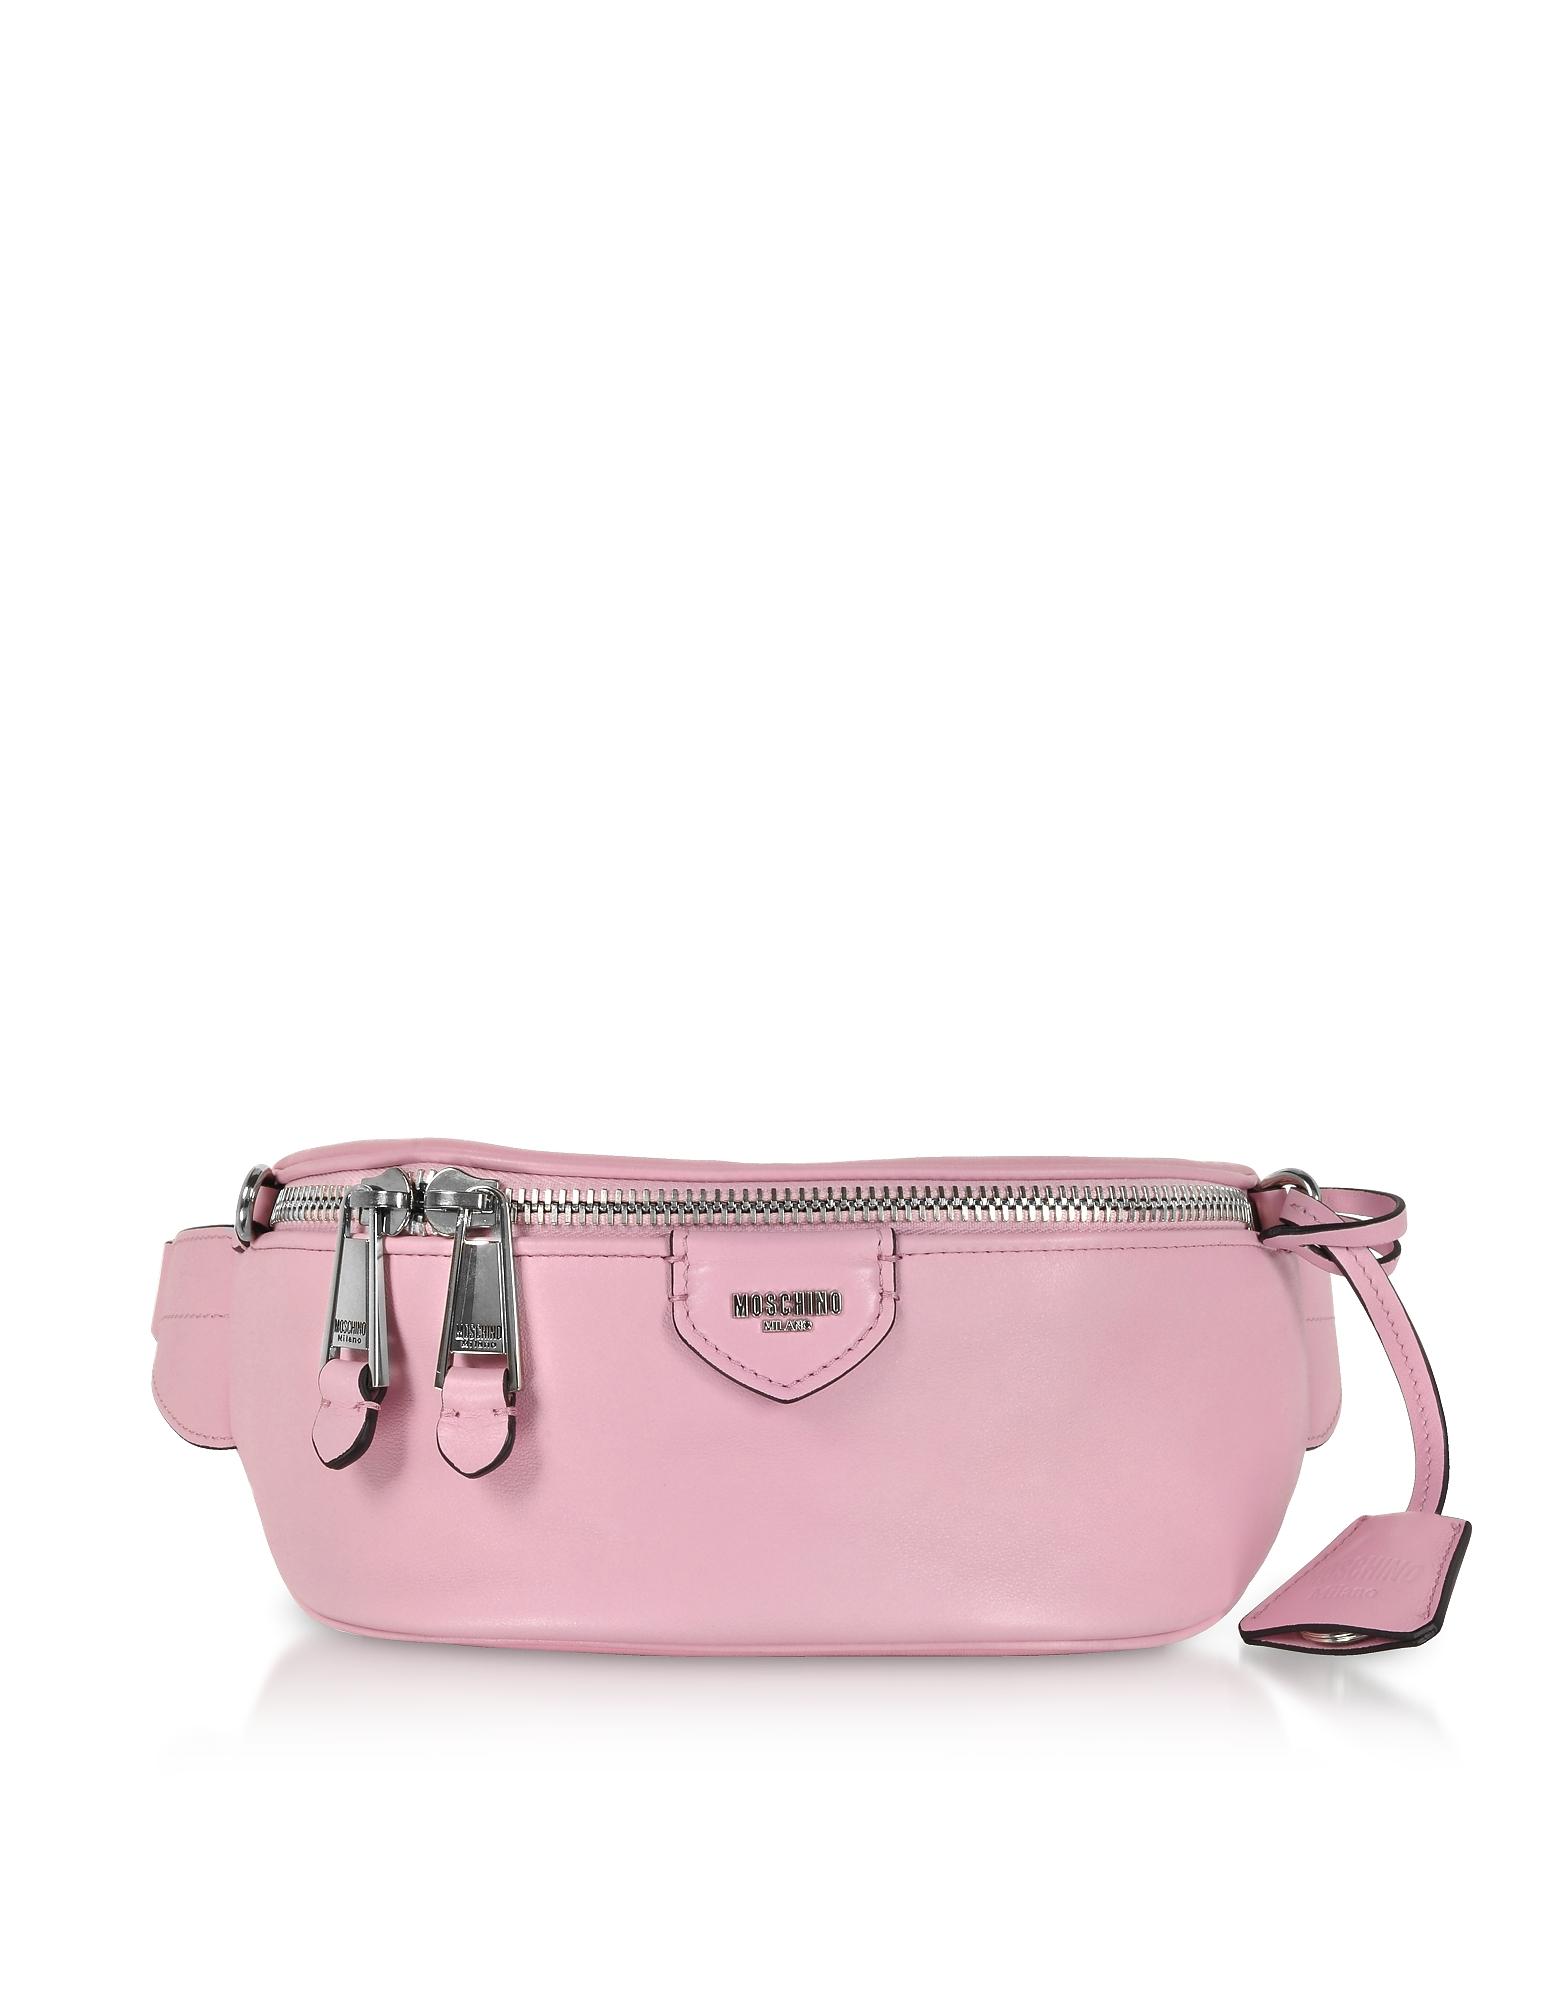 Moschino Handbags, Candy Pink Leather Belt Bag